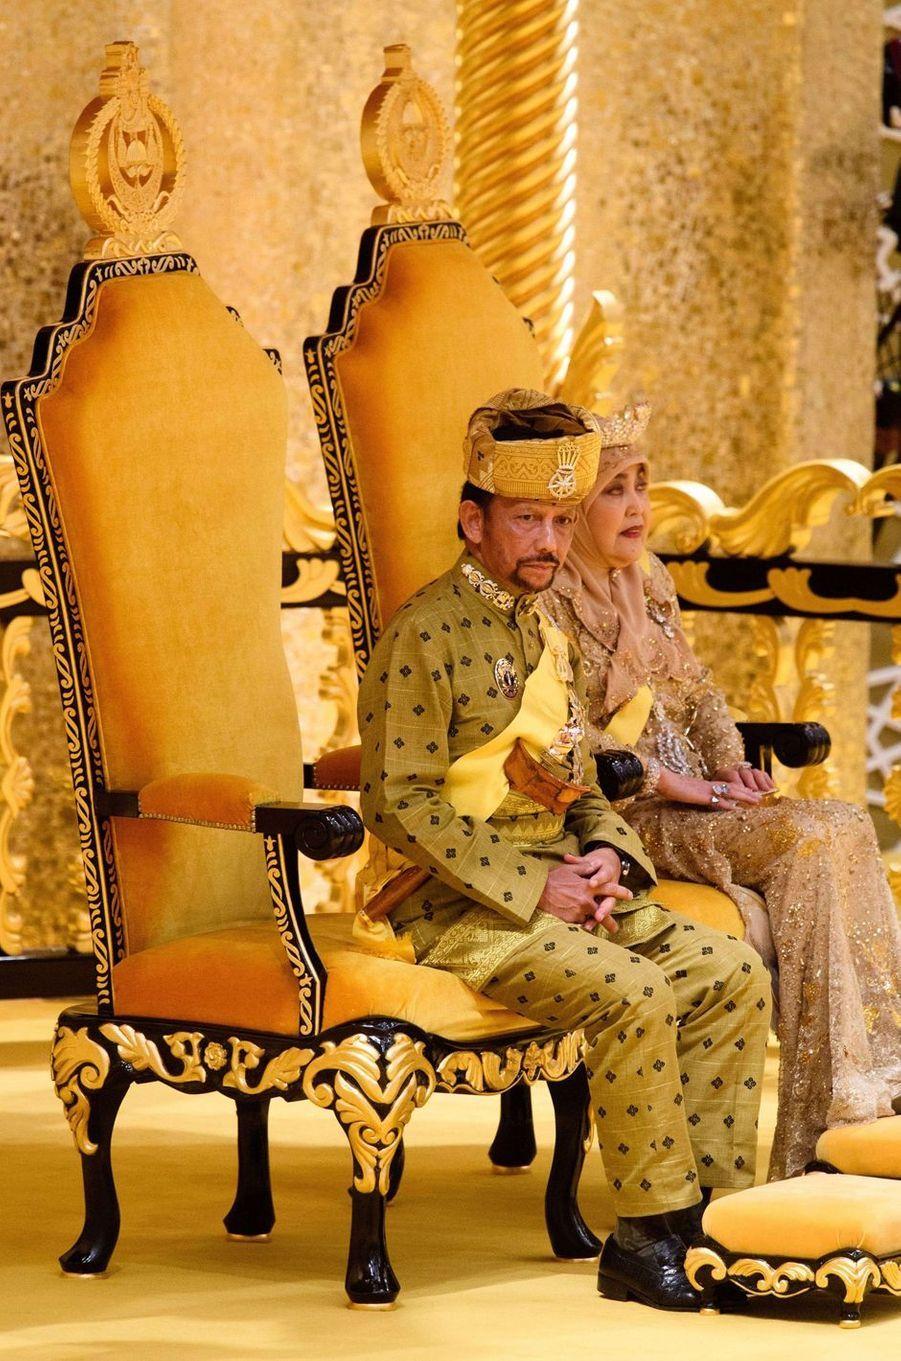 Le sultan de Brunei Hassanal Bolkiah et sa femme la reine Anak Hajah Saleha à Bandar Seri Begawan le 5 octobre 2017